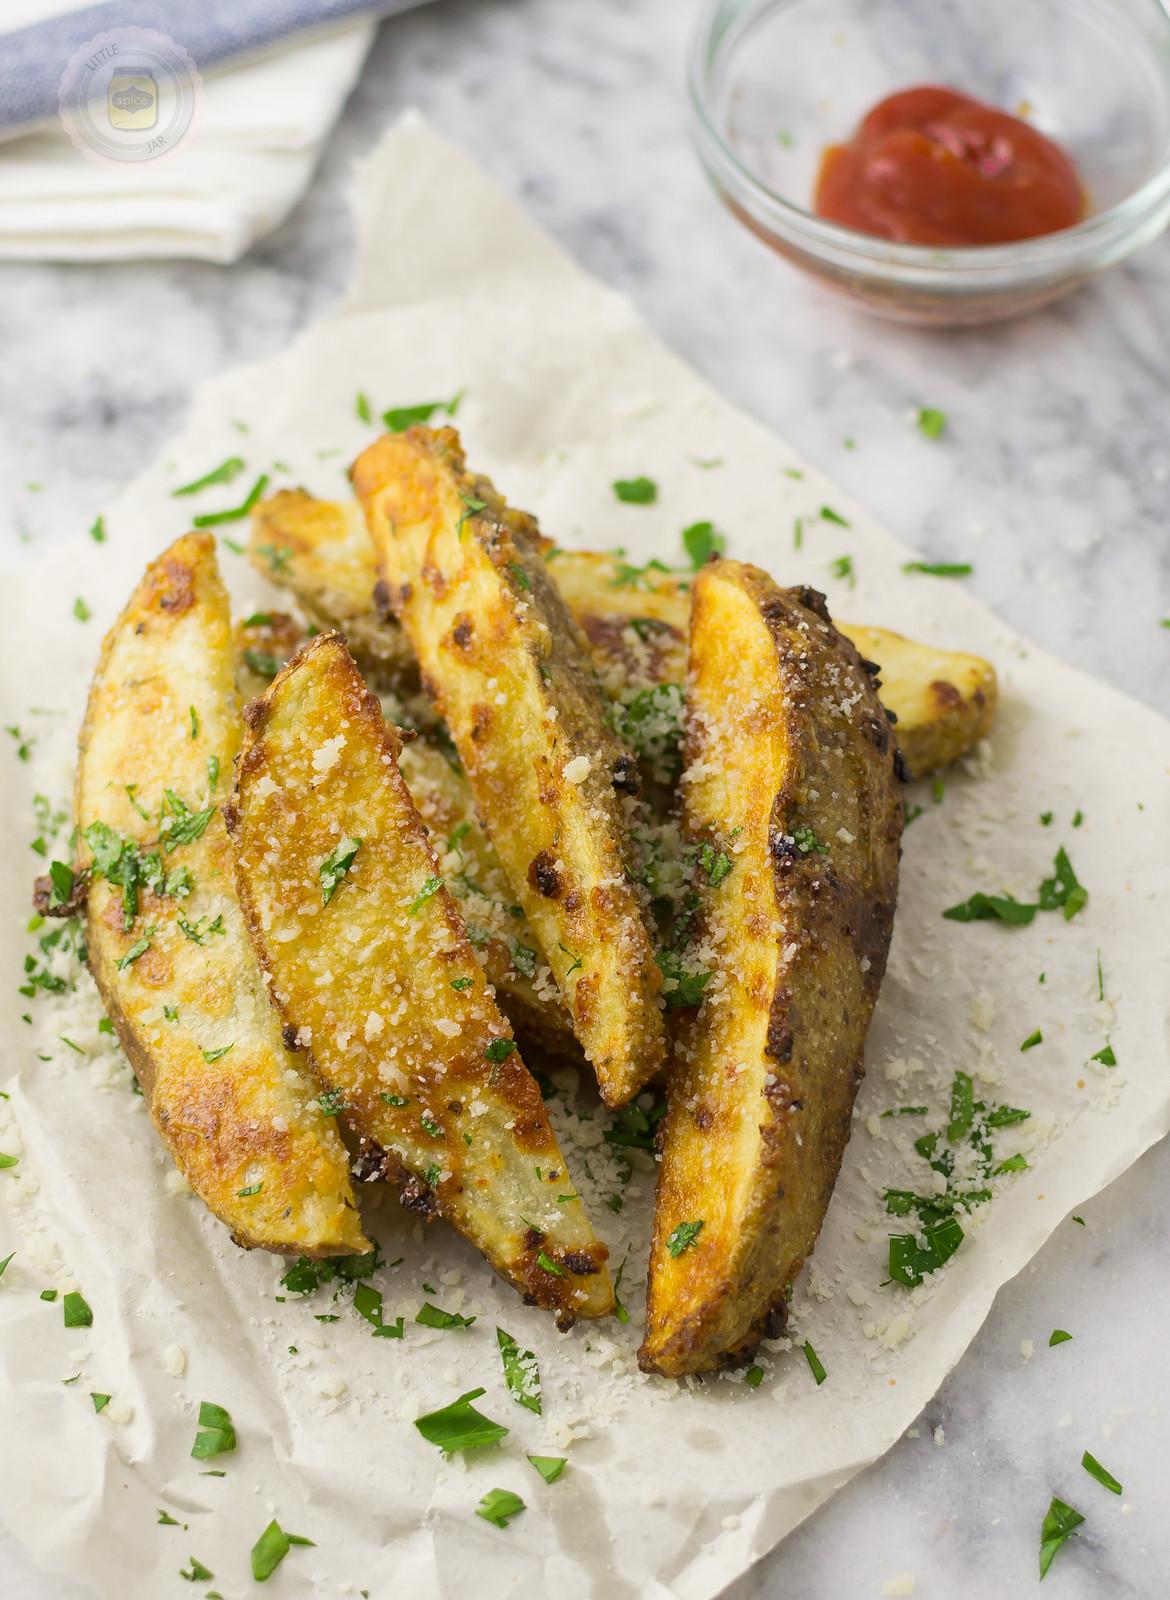 Healthy Garlic Parmesan Fries